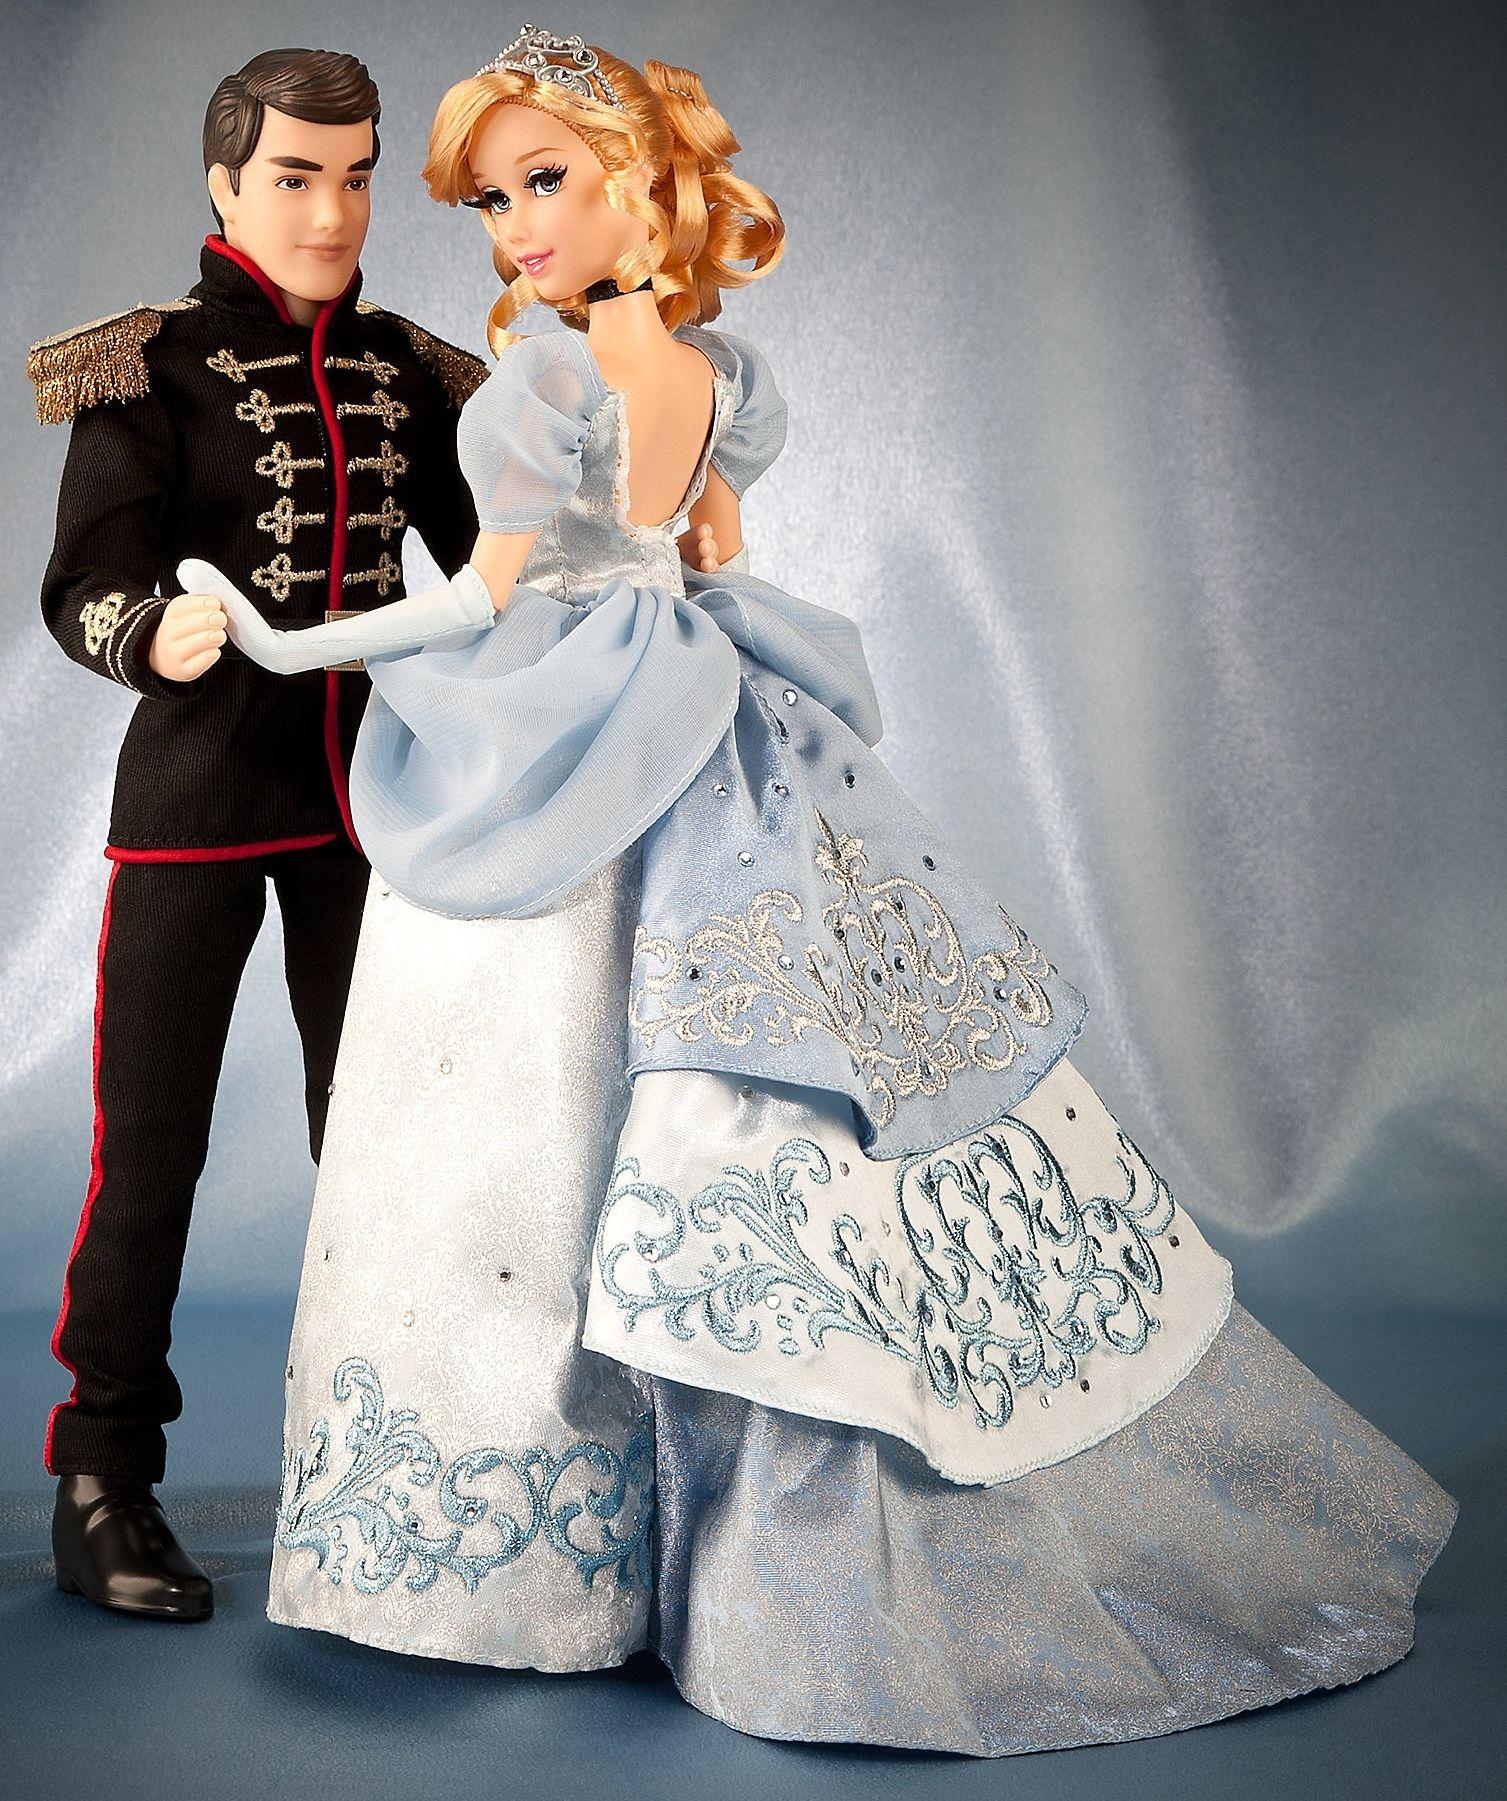 Disney Princess Cinderella Singing Doll And Costume Set: Disney Fairytale Designer